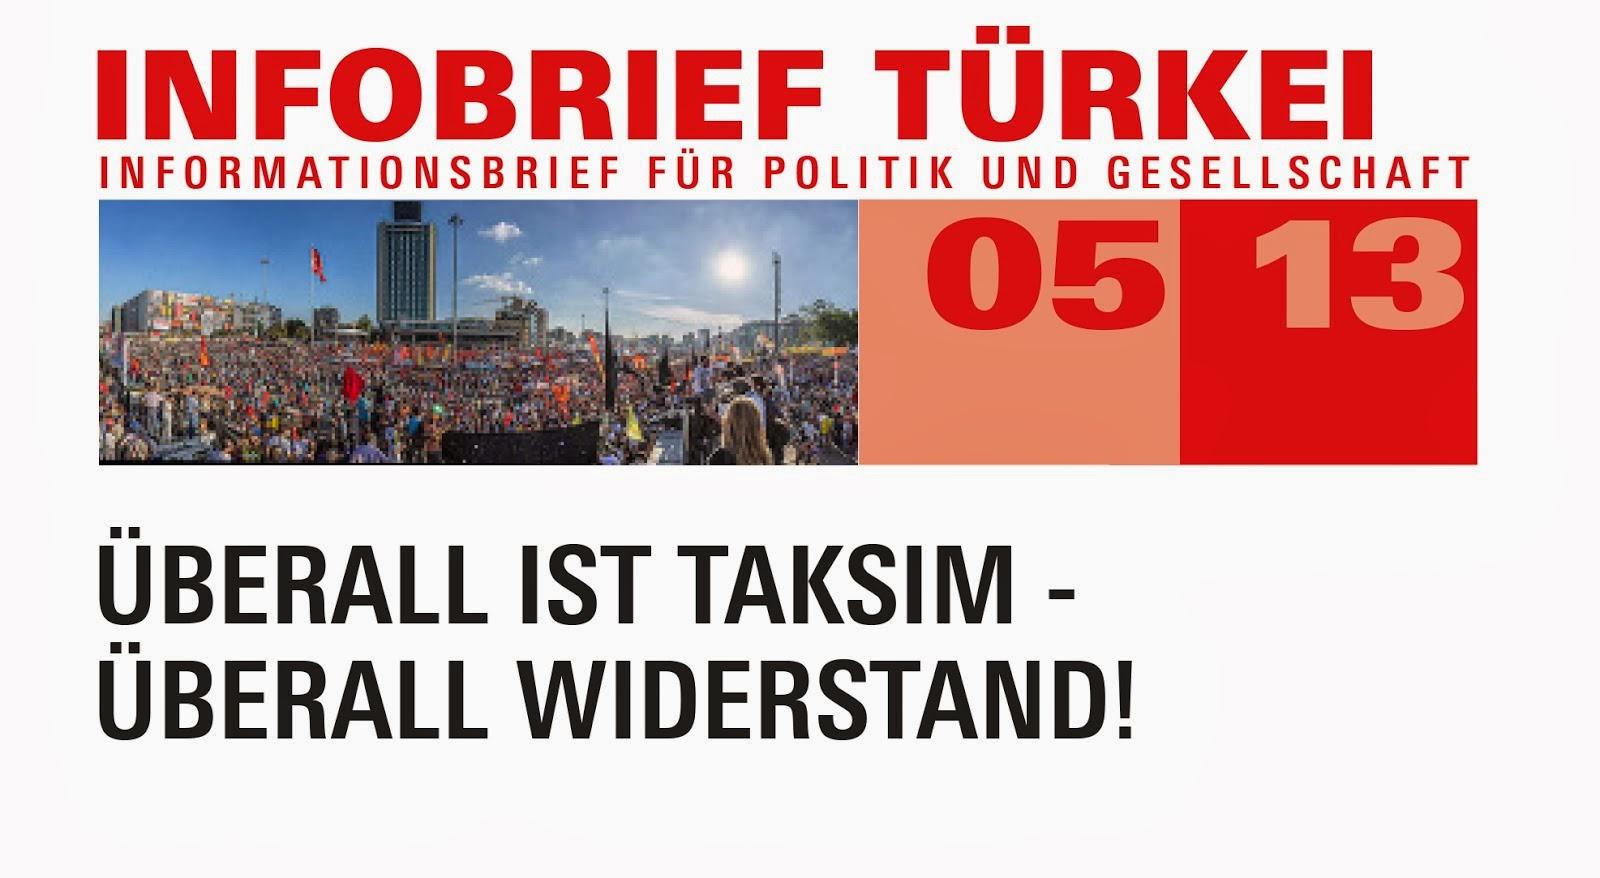 Infobrief Türkei 05/2013